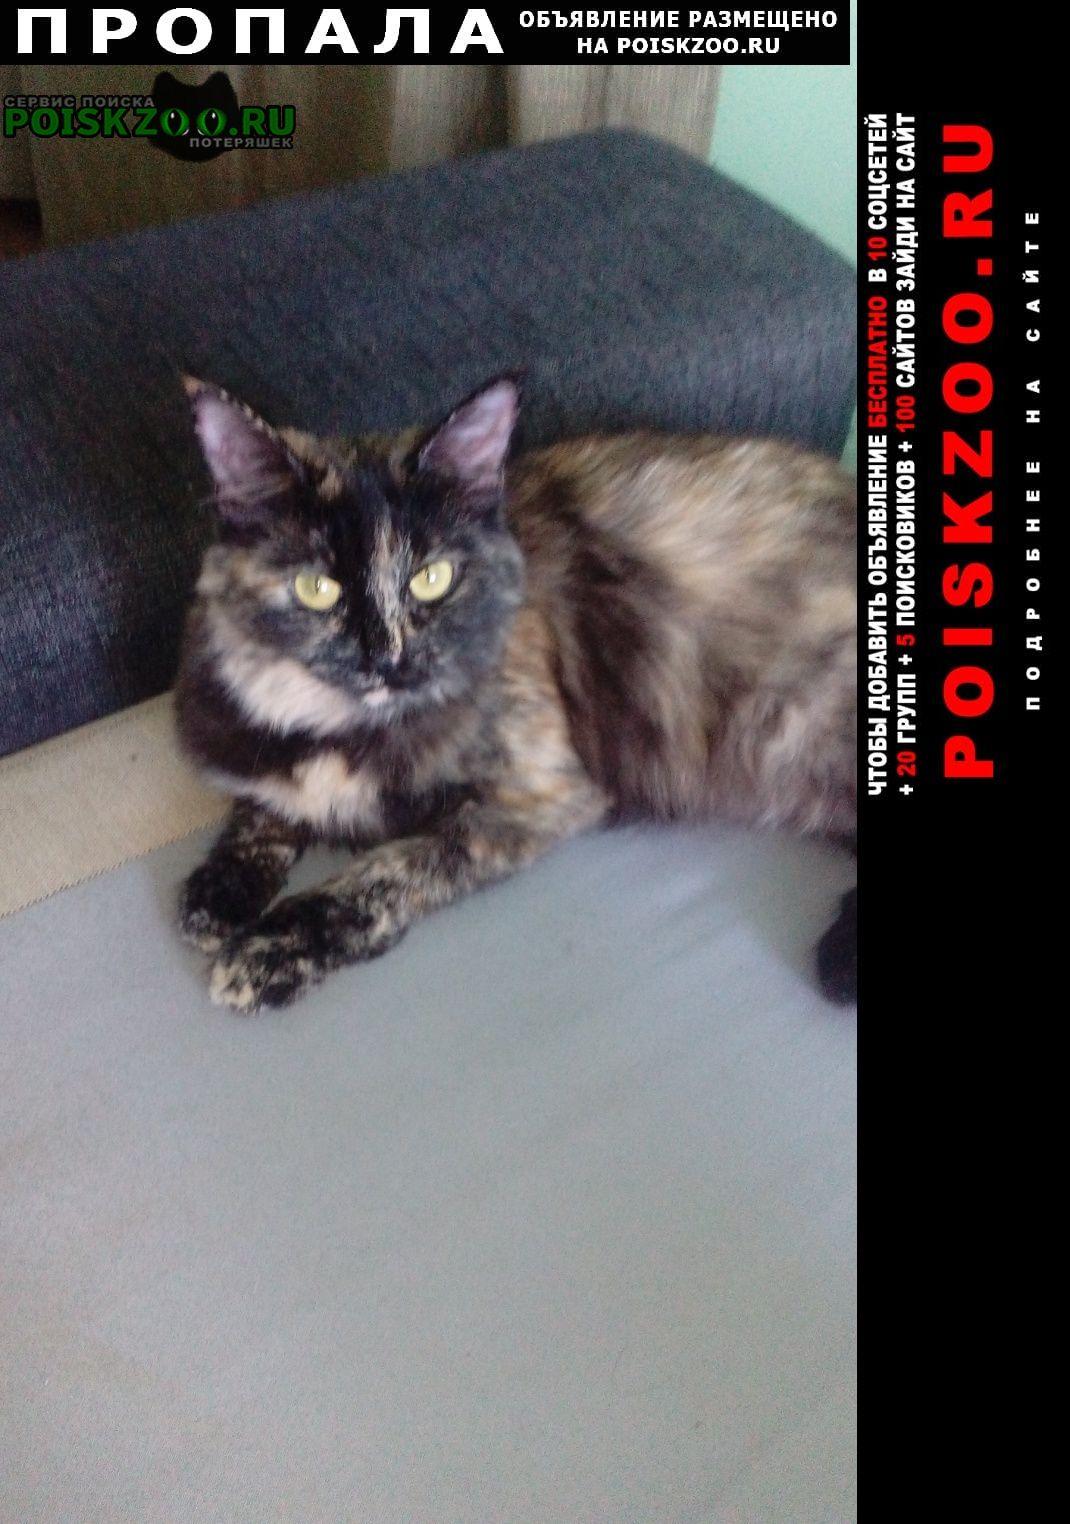 Богородск Пропала кошка